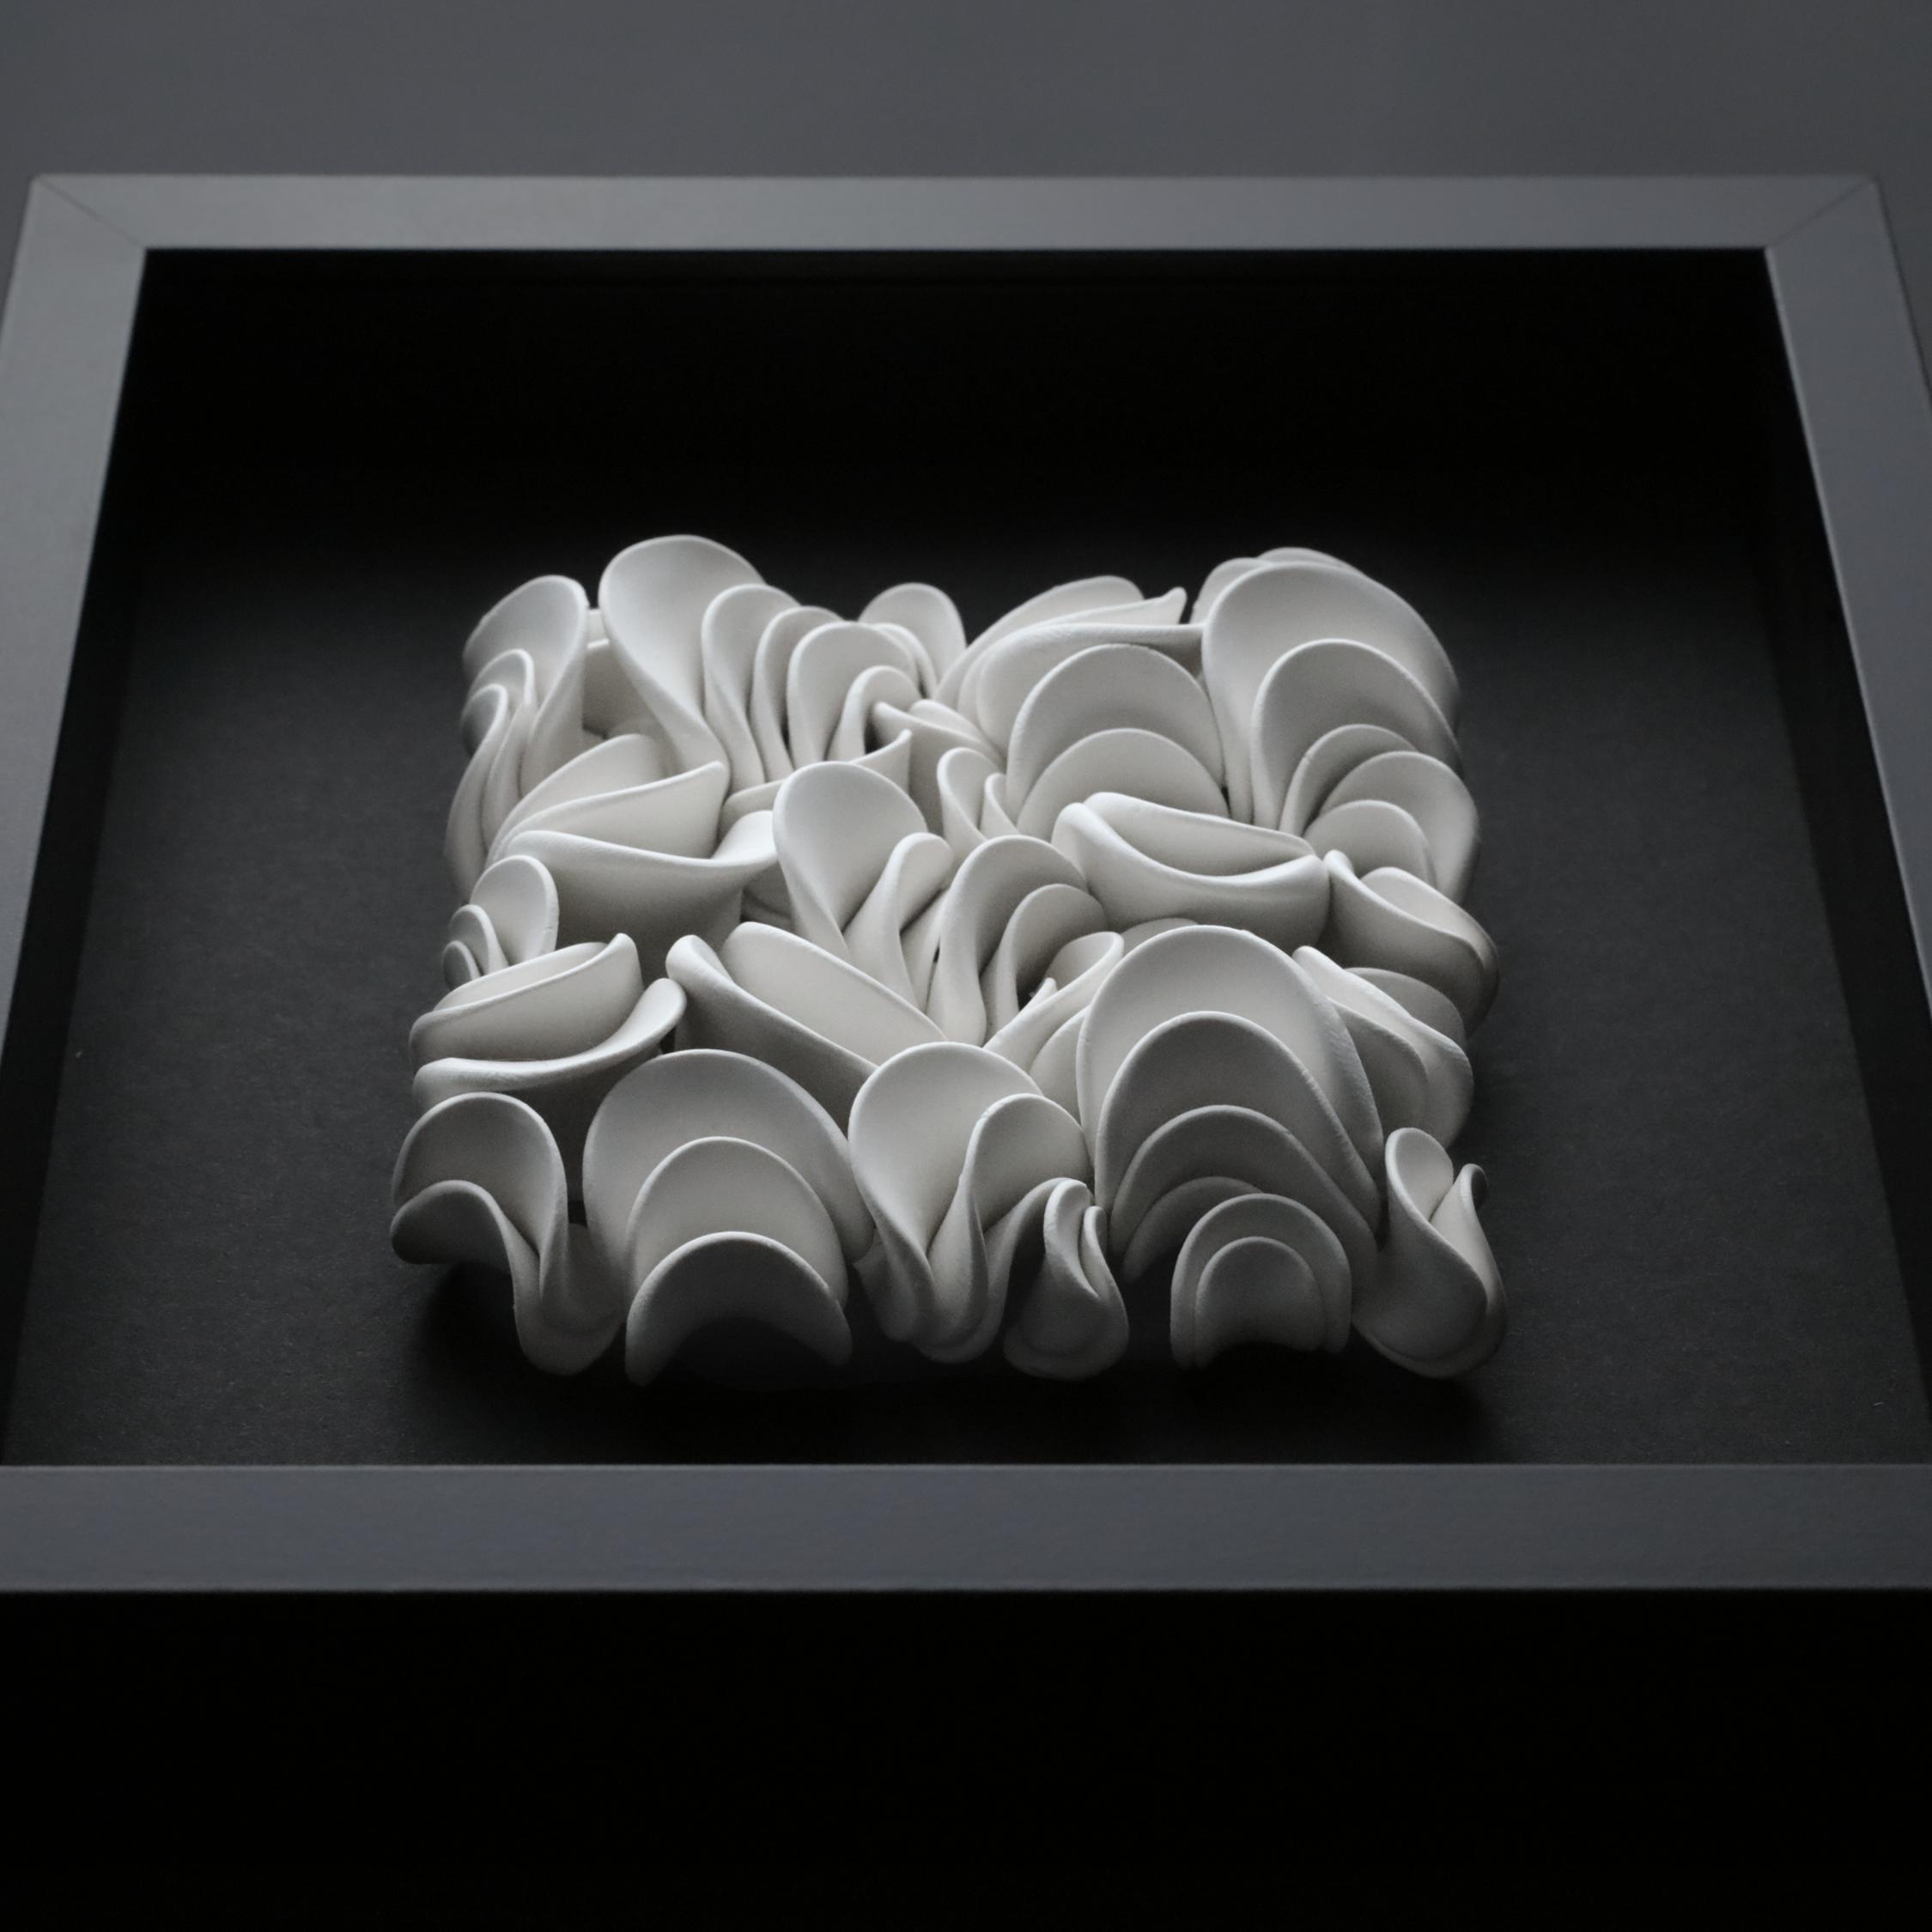 White Clay Tile 'Tectorum' Ceramic Wall Sculpture